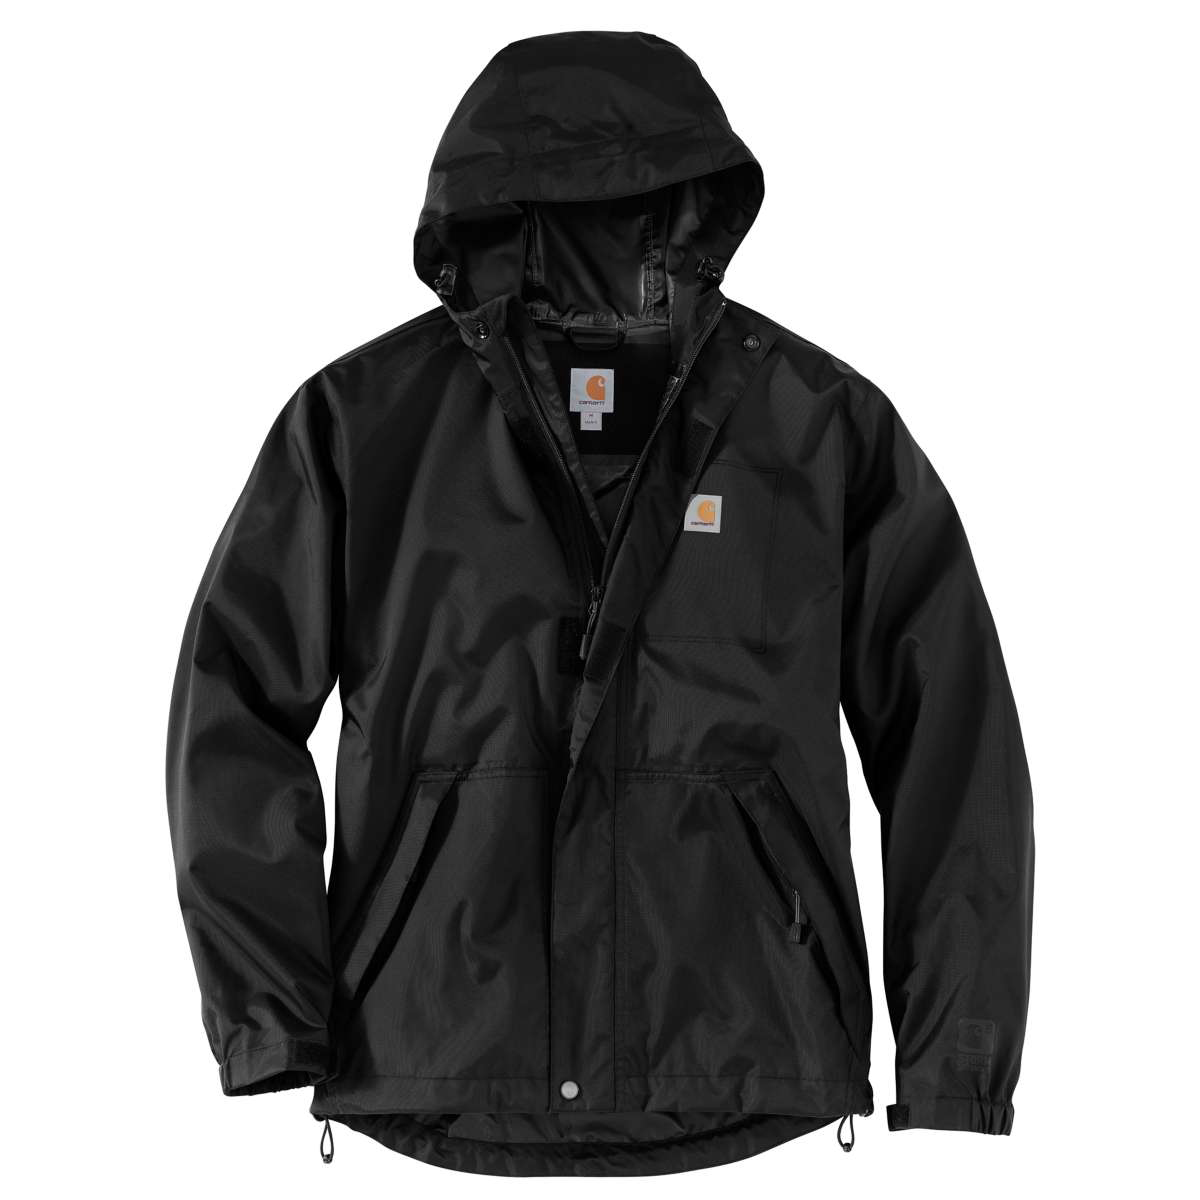 Carhartt Men's Dry Harbor Jacket - Black, XXL